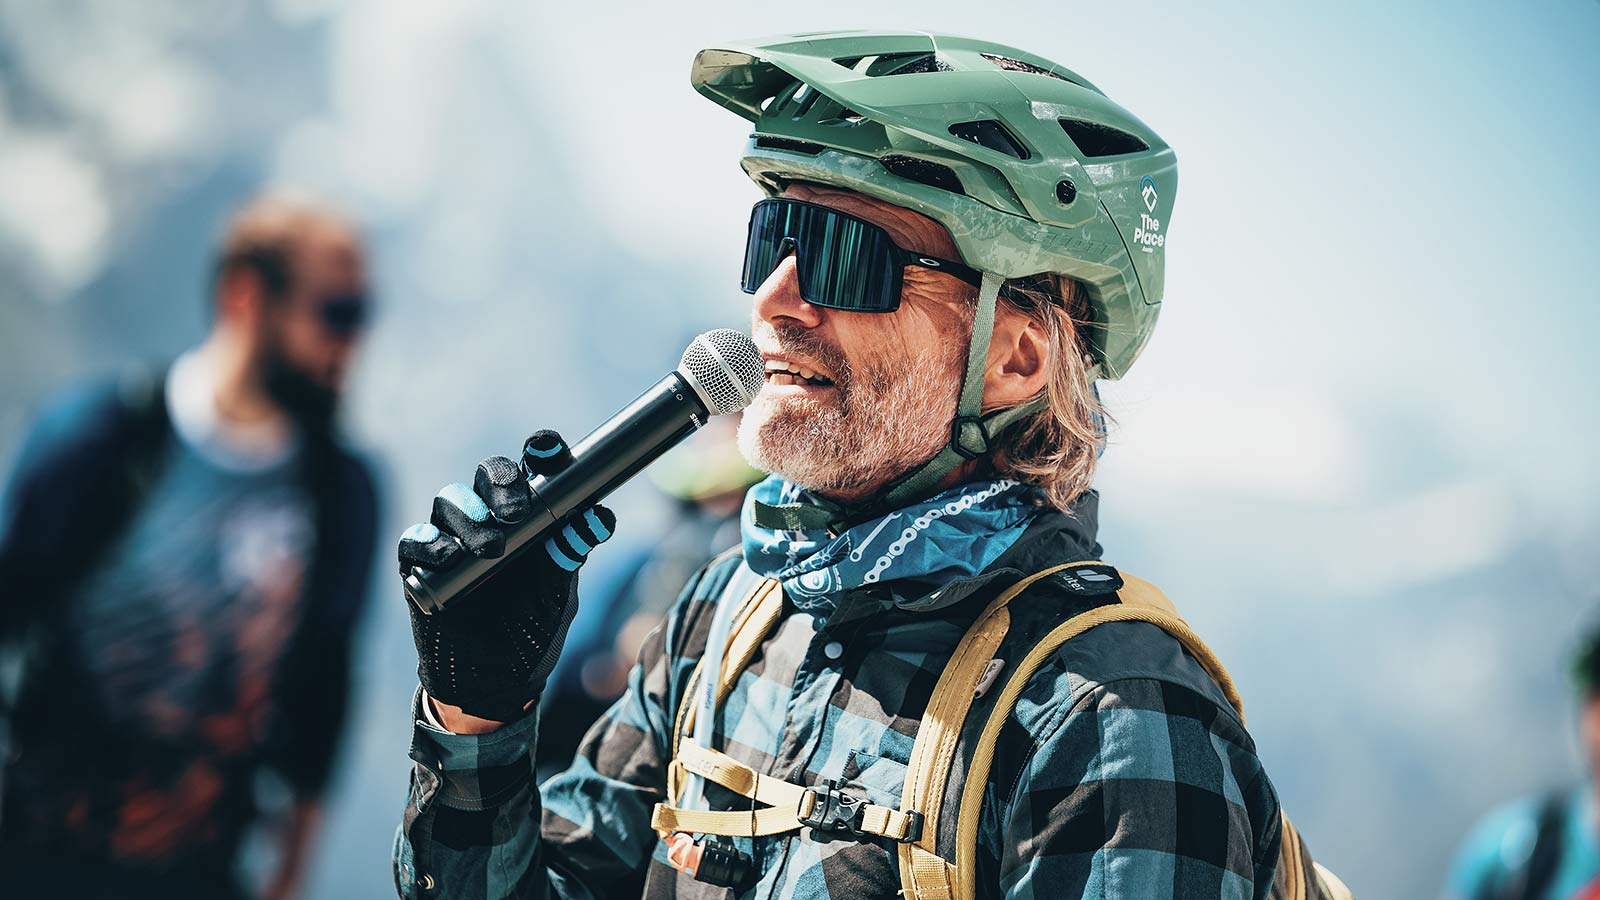 Event Schnitzeljagd 2021 Sölden Ötztal - Holger Meyer - Event